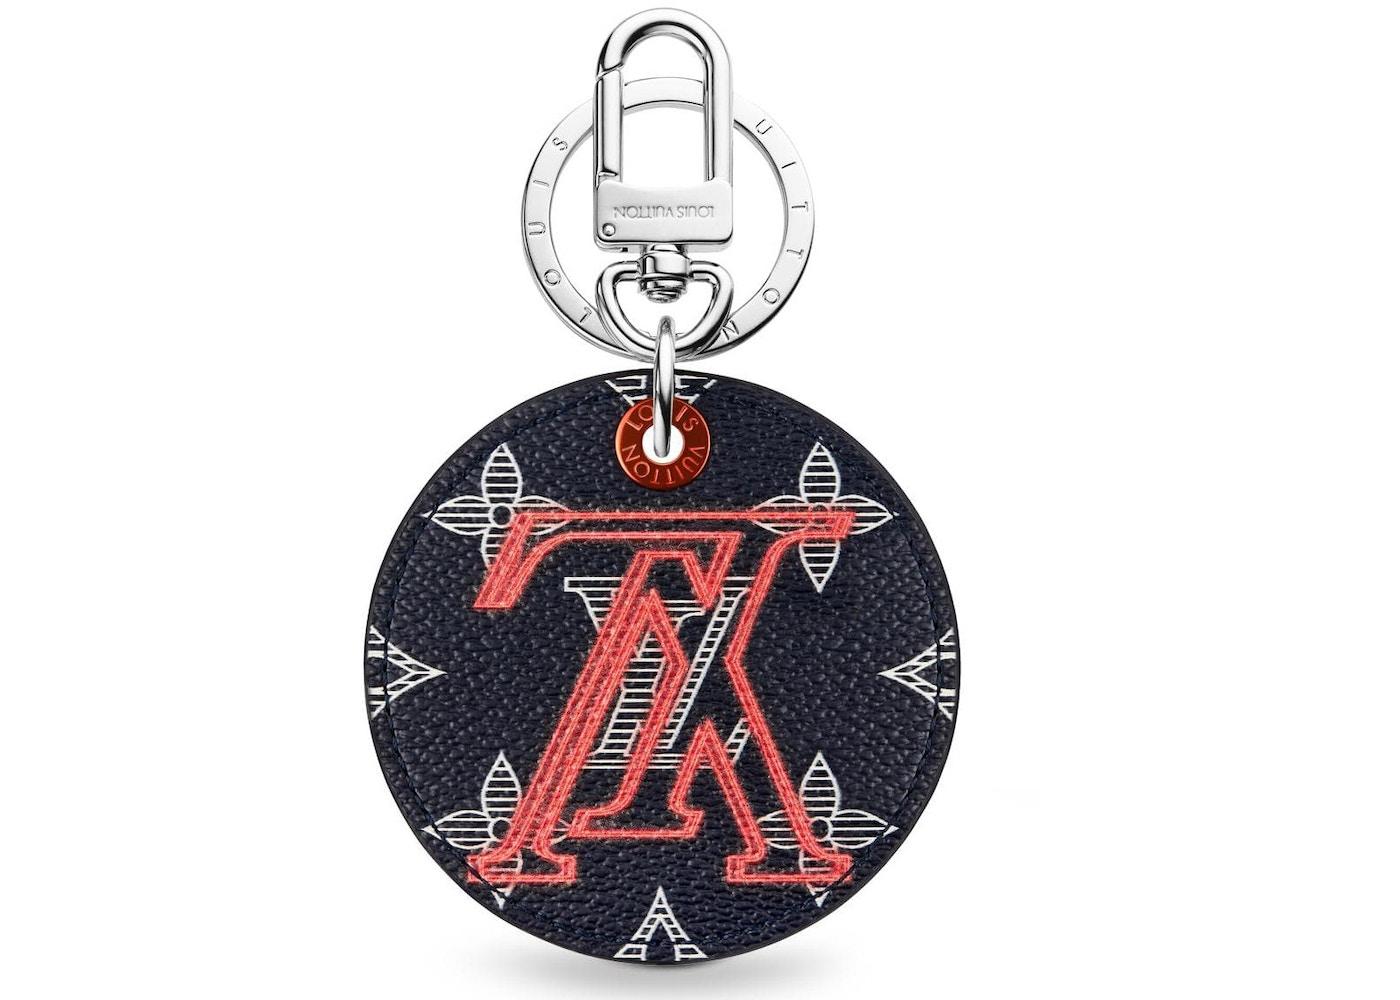 dc4248f22a Louis Vuitton Illustre Bag Charm and Key Holder Monogram Upside Down Ink  Navy